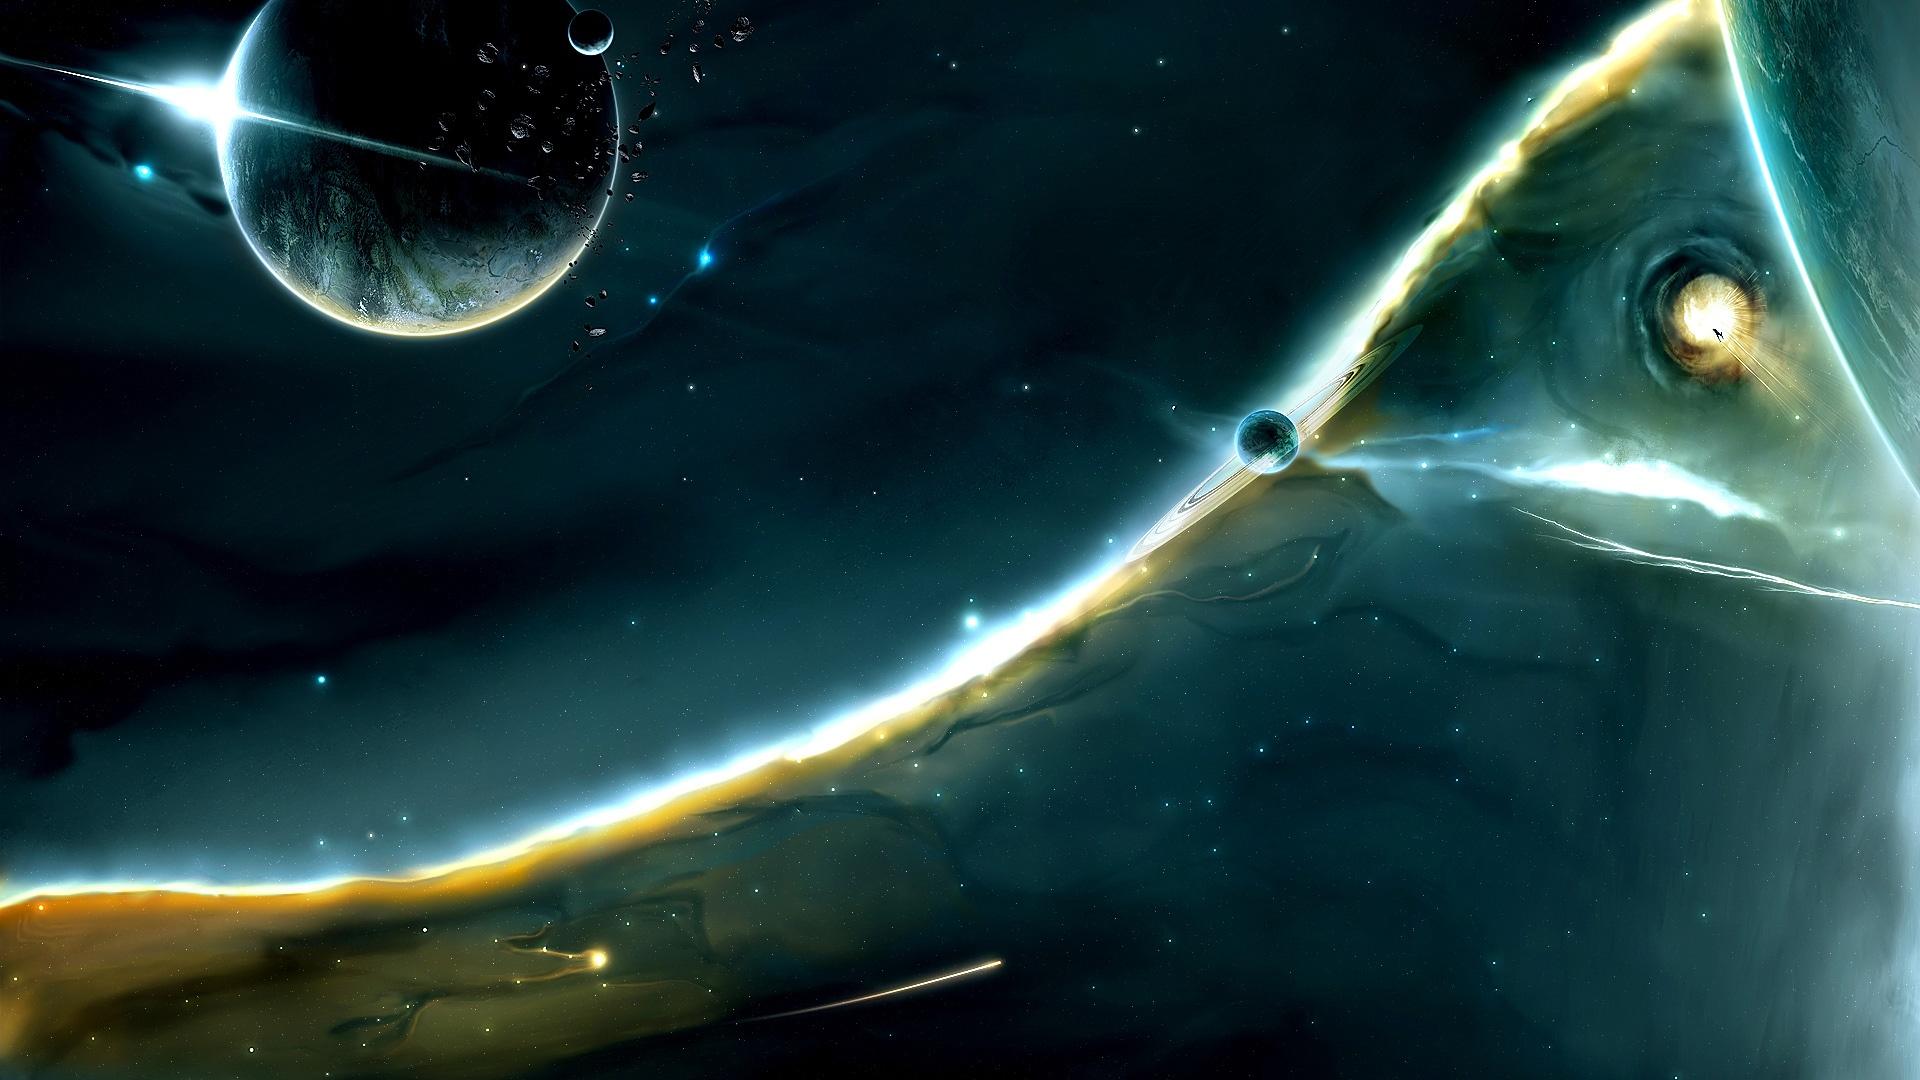 Sci Fi - Artistic  Wallpaper